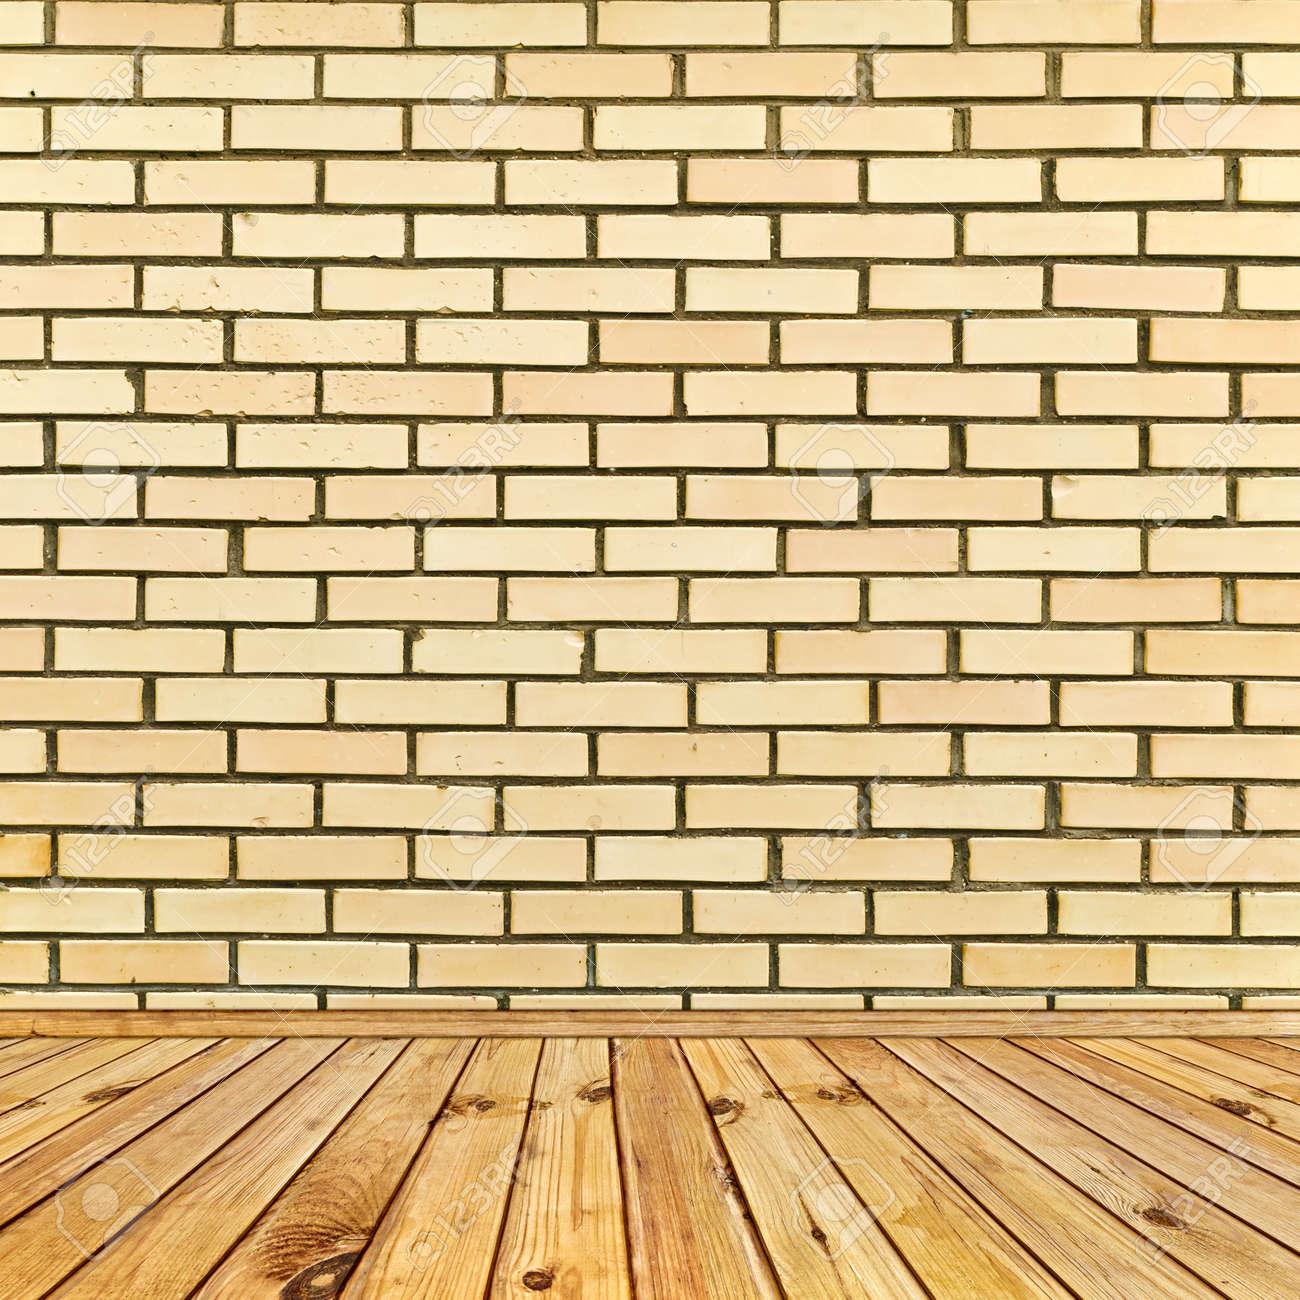 beige brick wall and